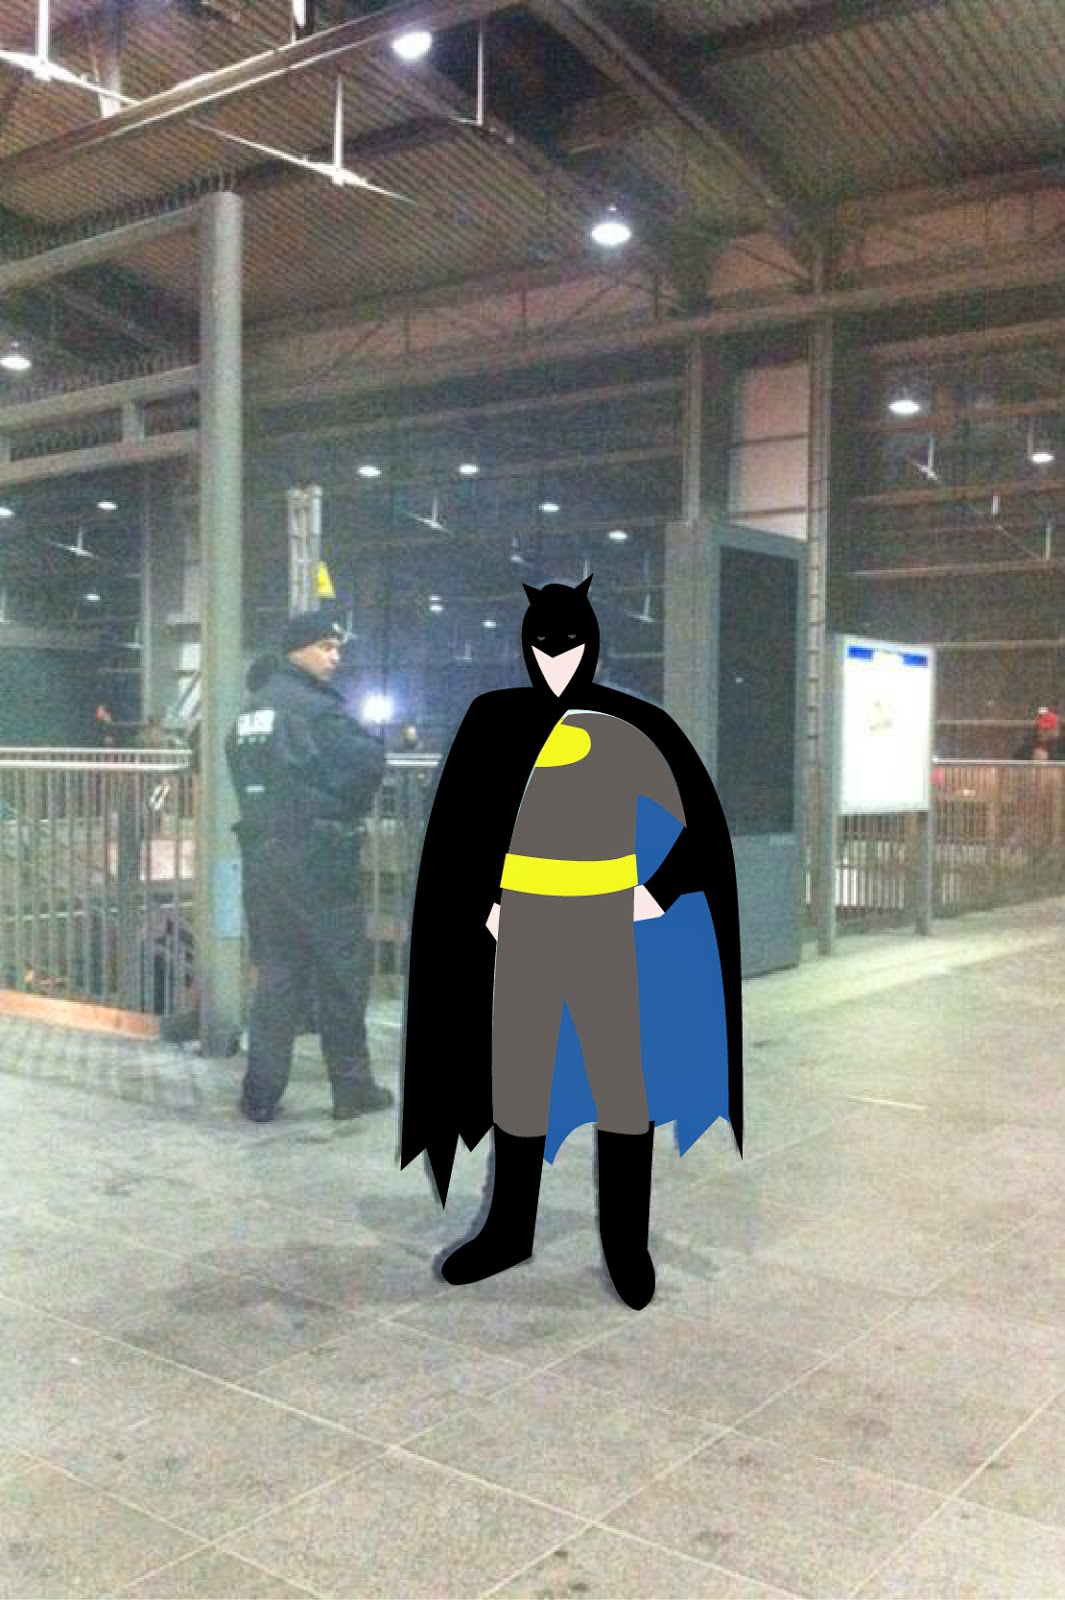 Maskworld Batman in Berliner U-Bahn Kostüm in U-Bahn Berlin ist verrückt Yolo Berlin Das Leben ist kein U-Bahnhof